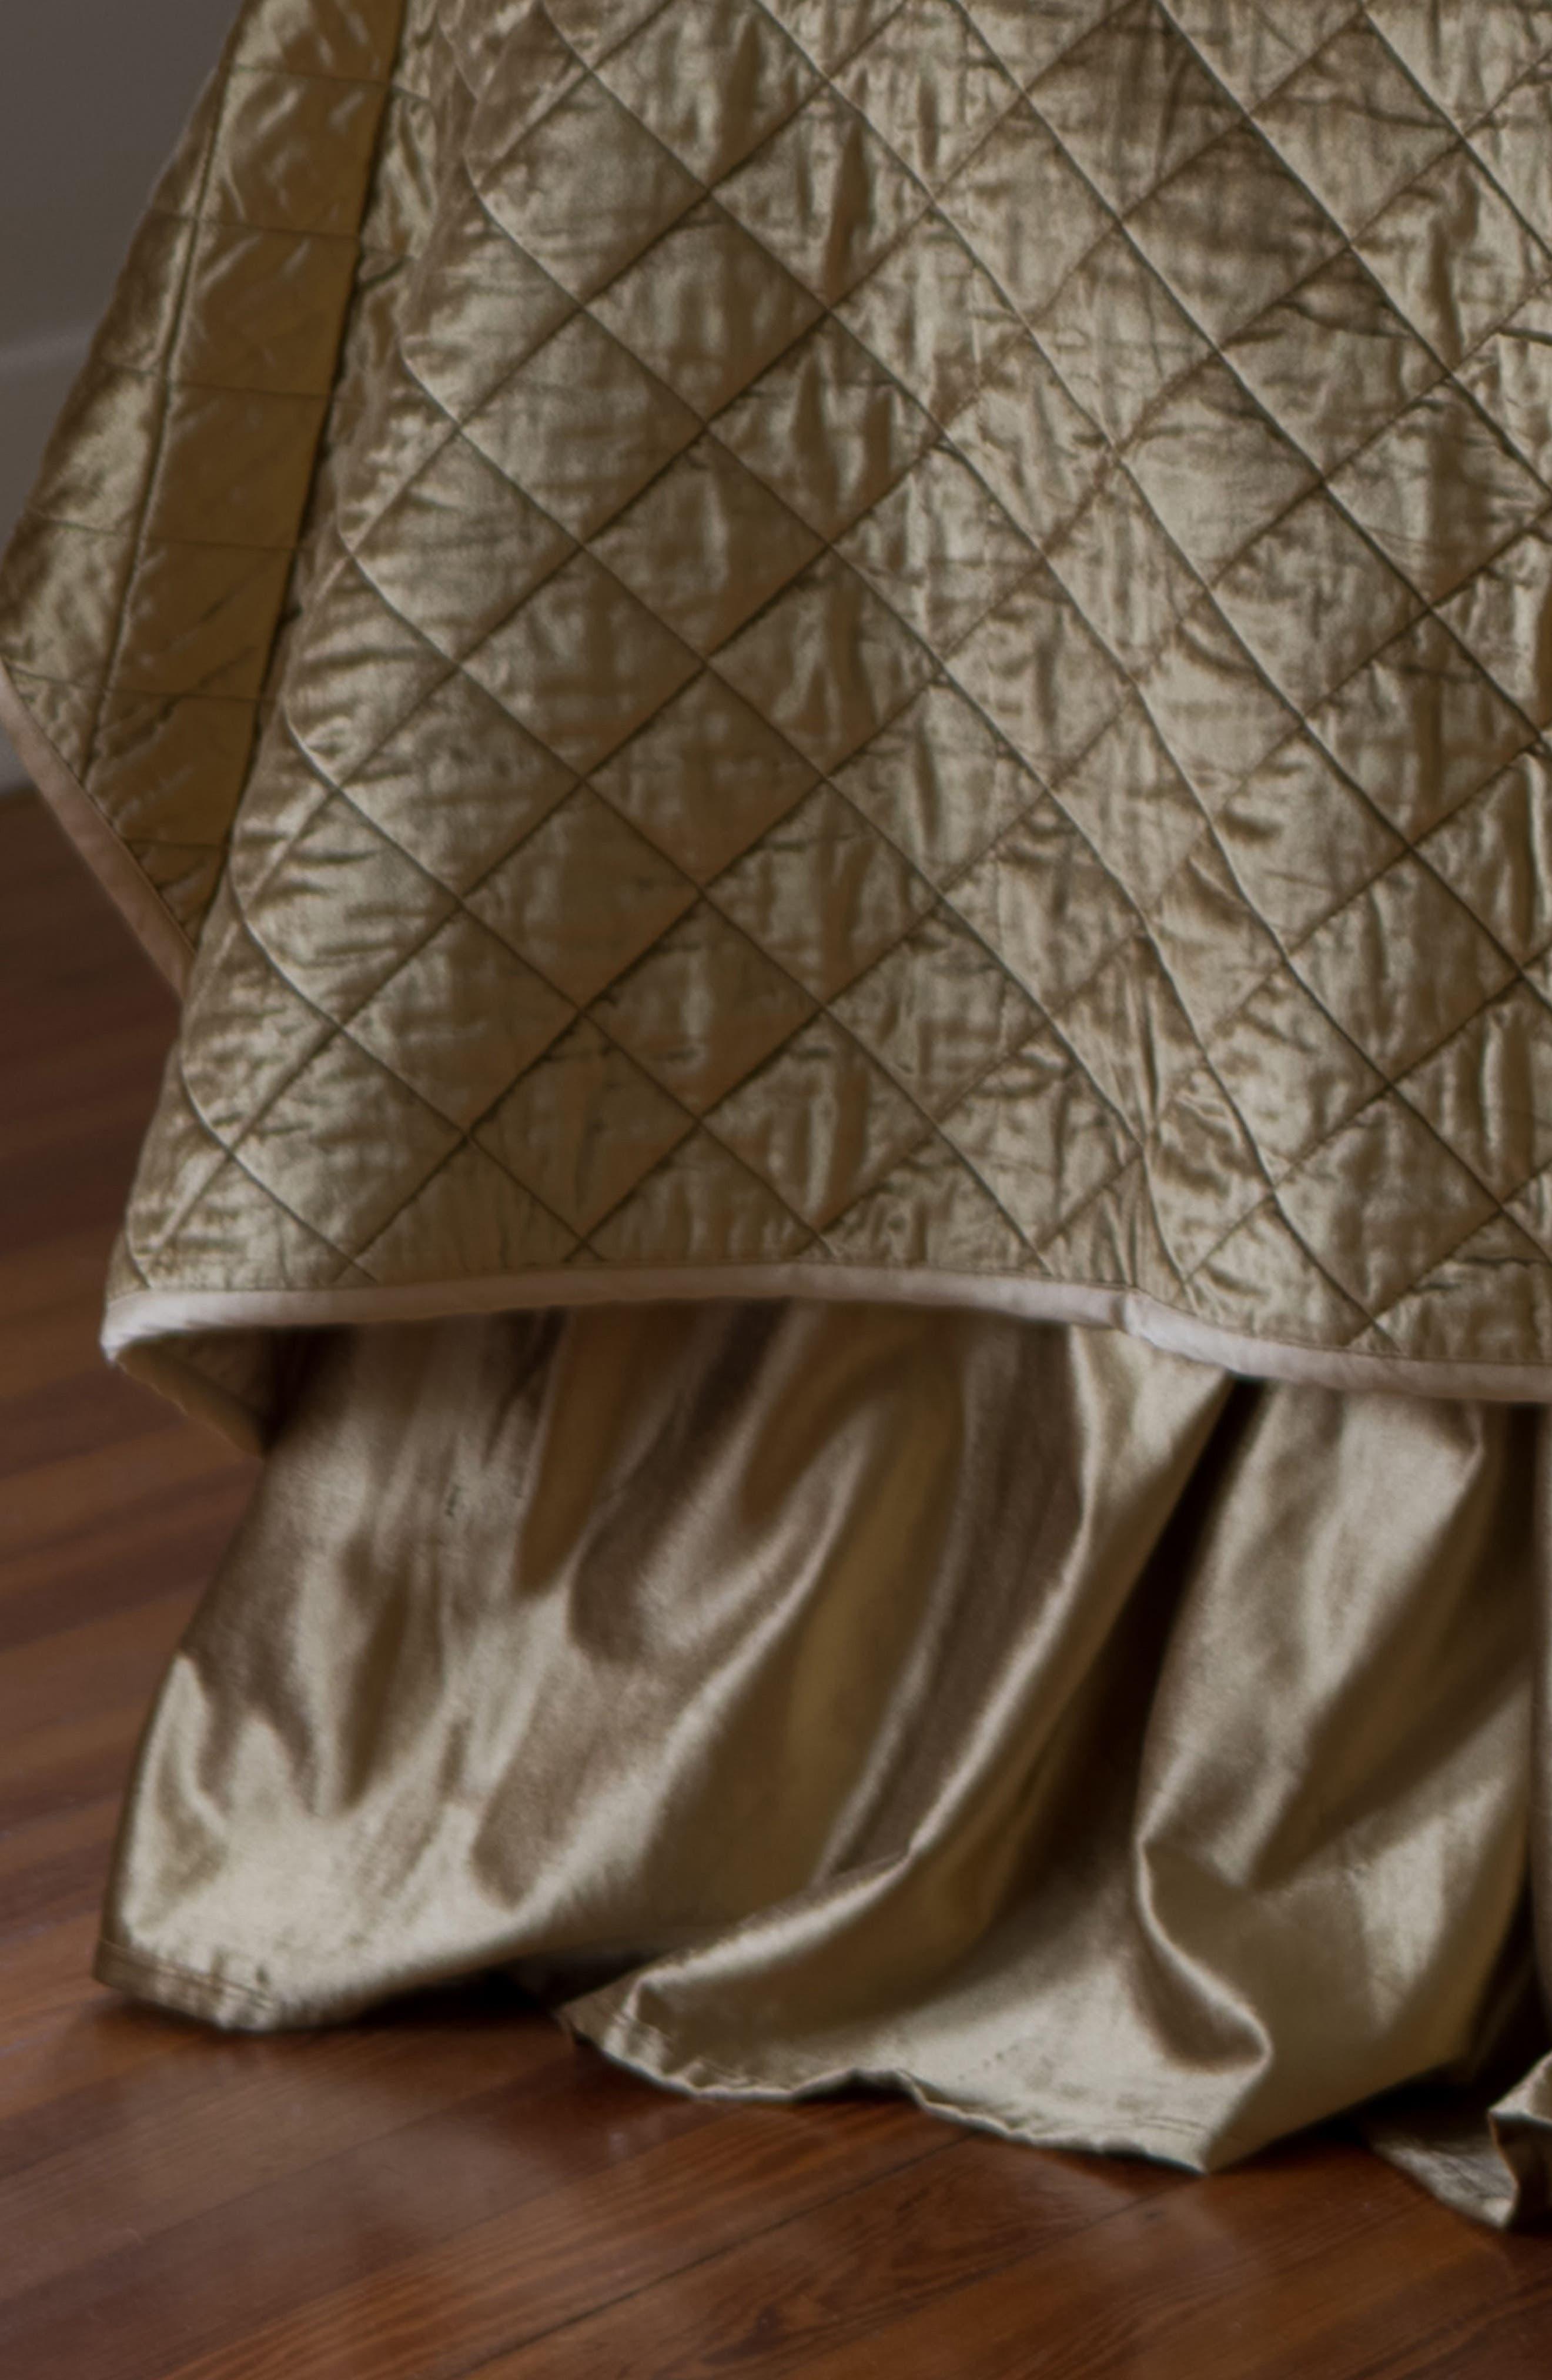 Main Image - Lili Alessandra Chloe Bed Skirt